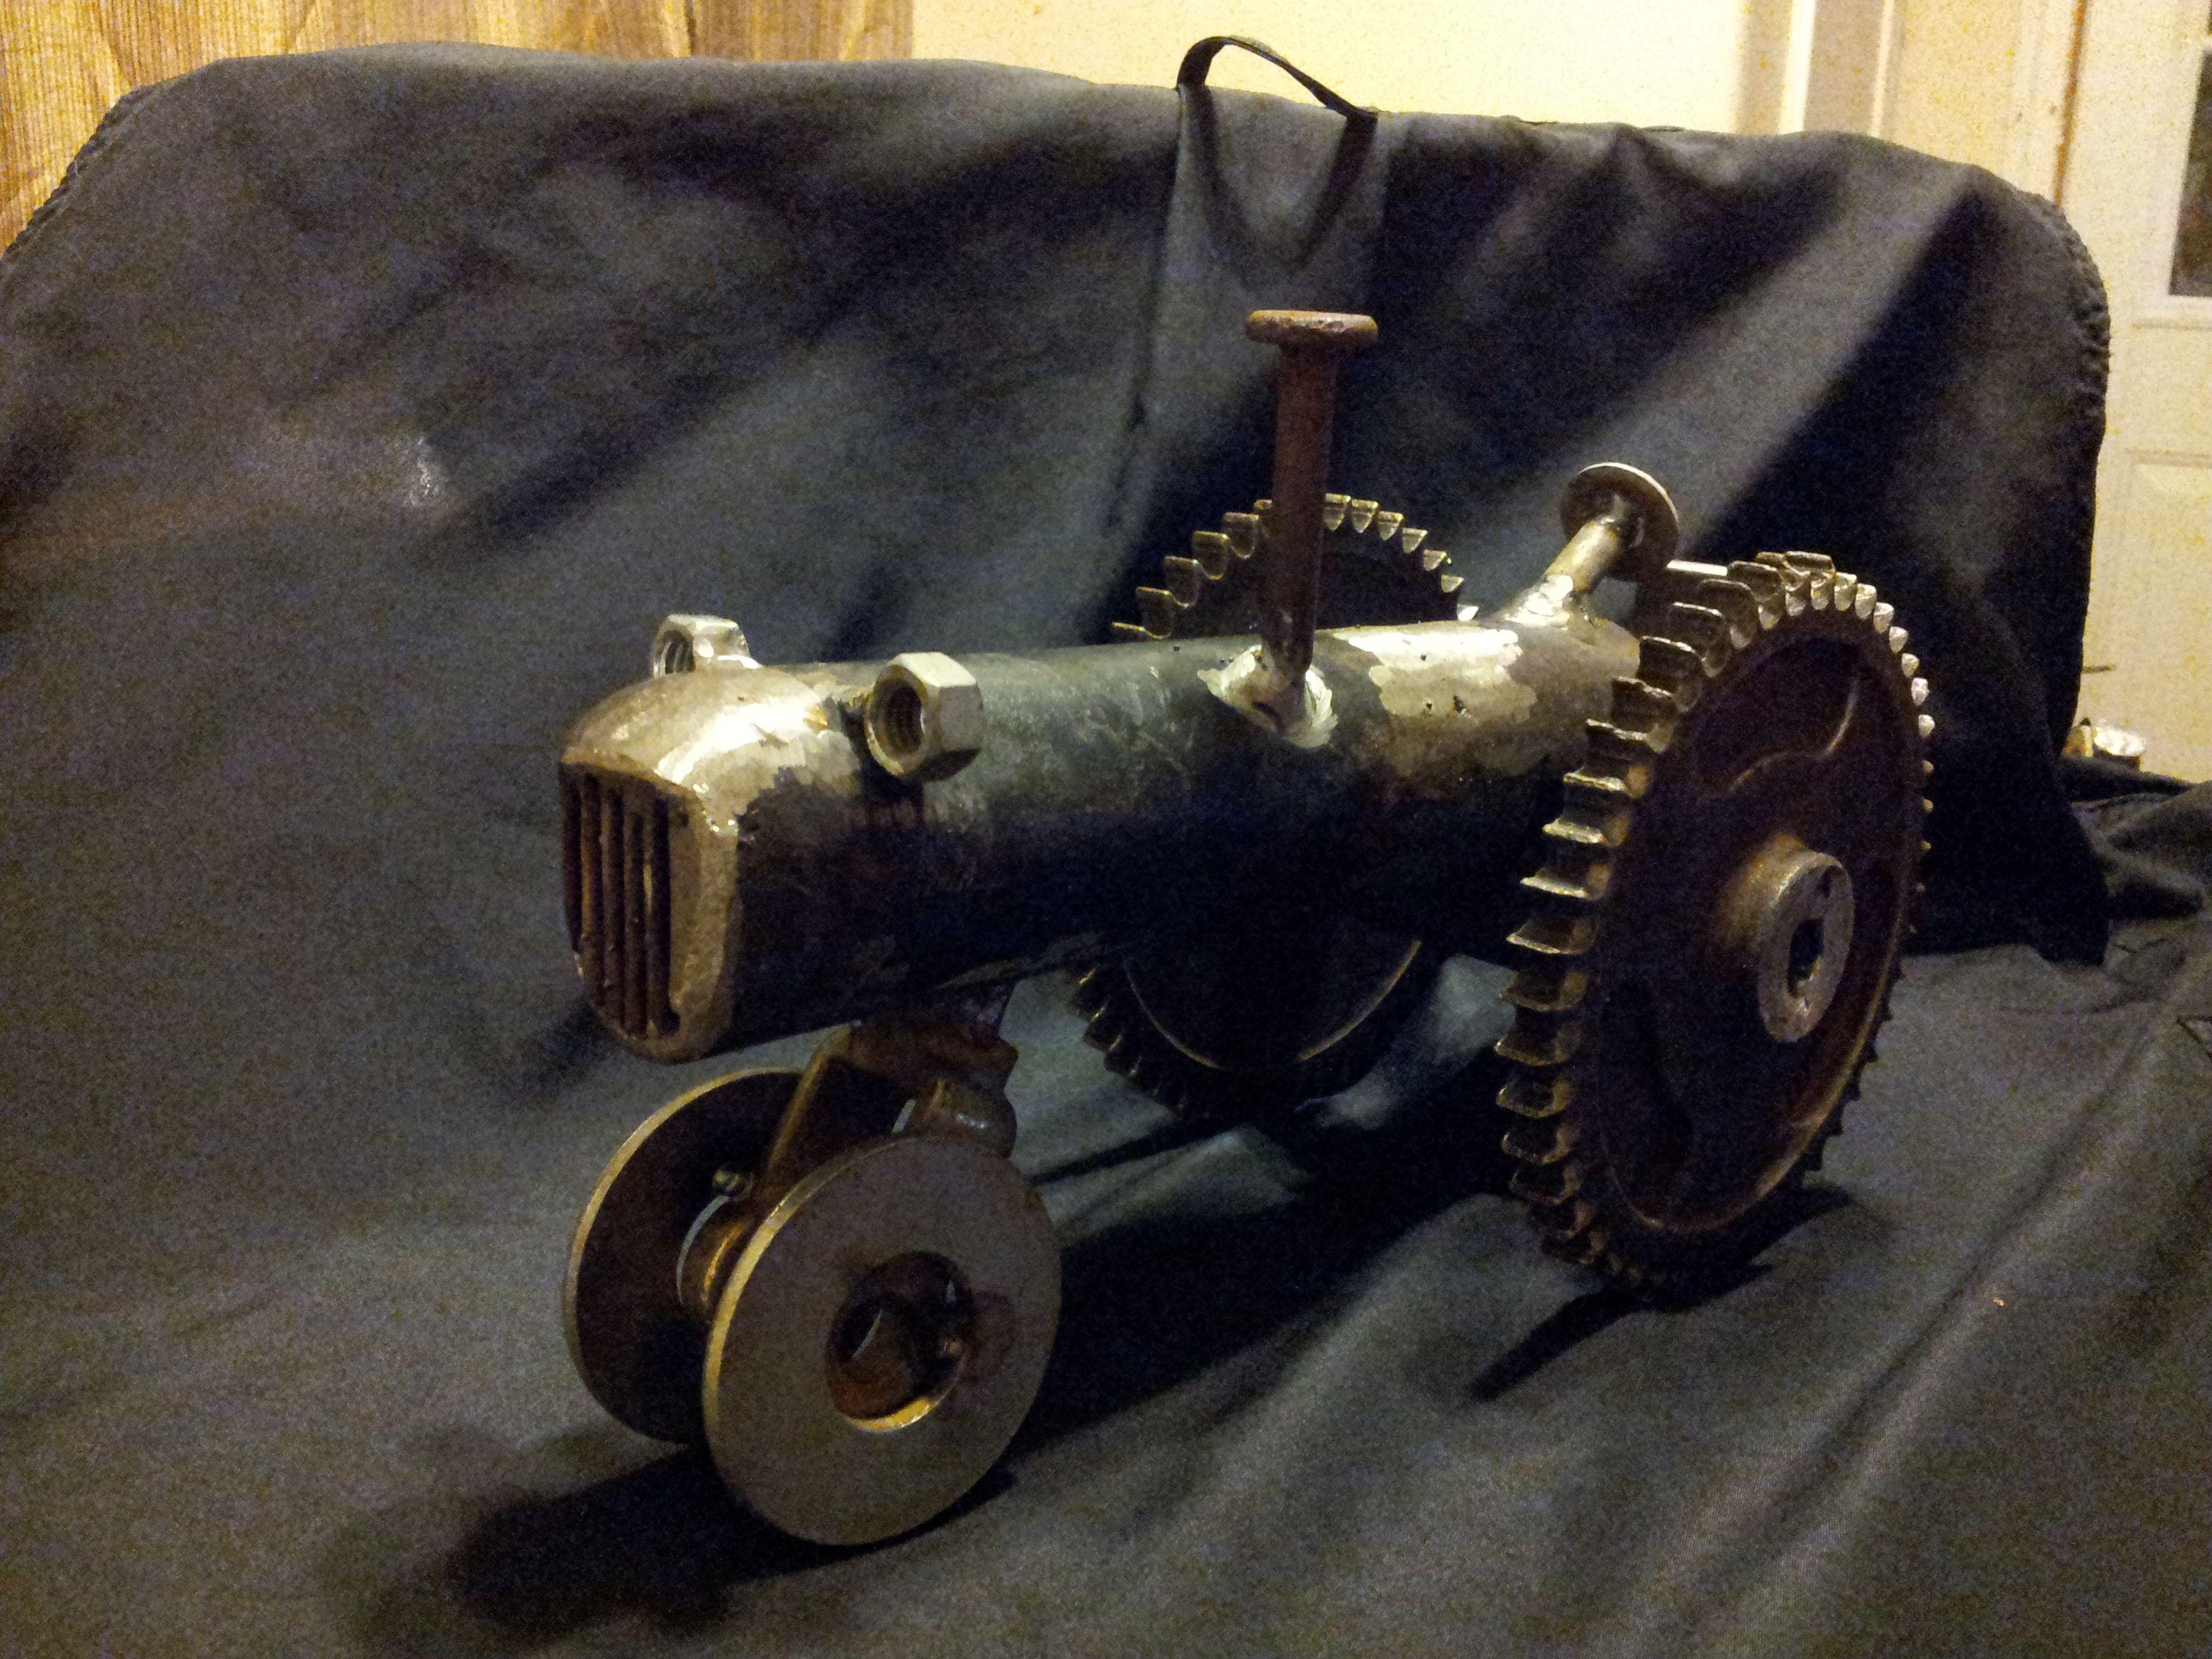 Metal Art Tractor : Scrap farm tractor metal art pinterest